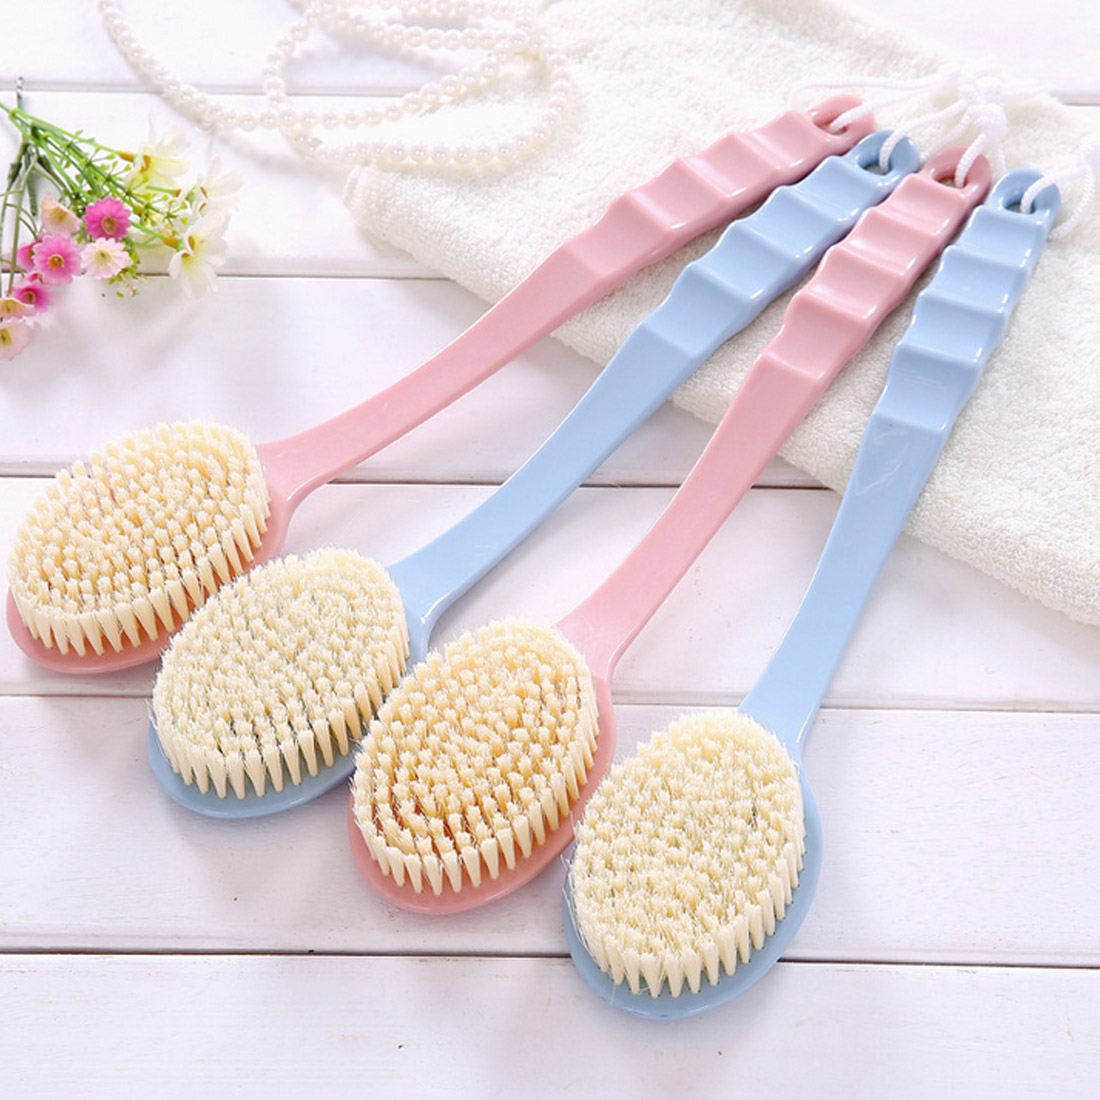 Dry Skin Body Spa Remove Dead Skin Body Massage Shower Brush Bath Brush Long Handled Body Bath Shower Back Brush